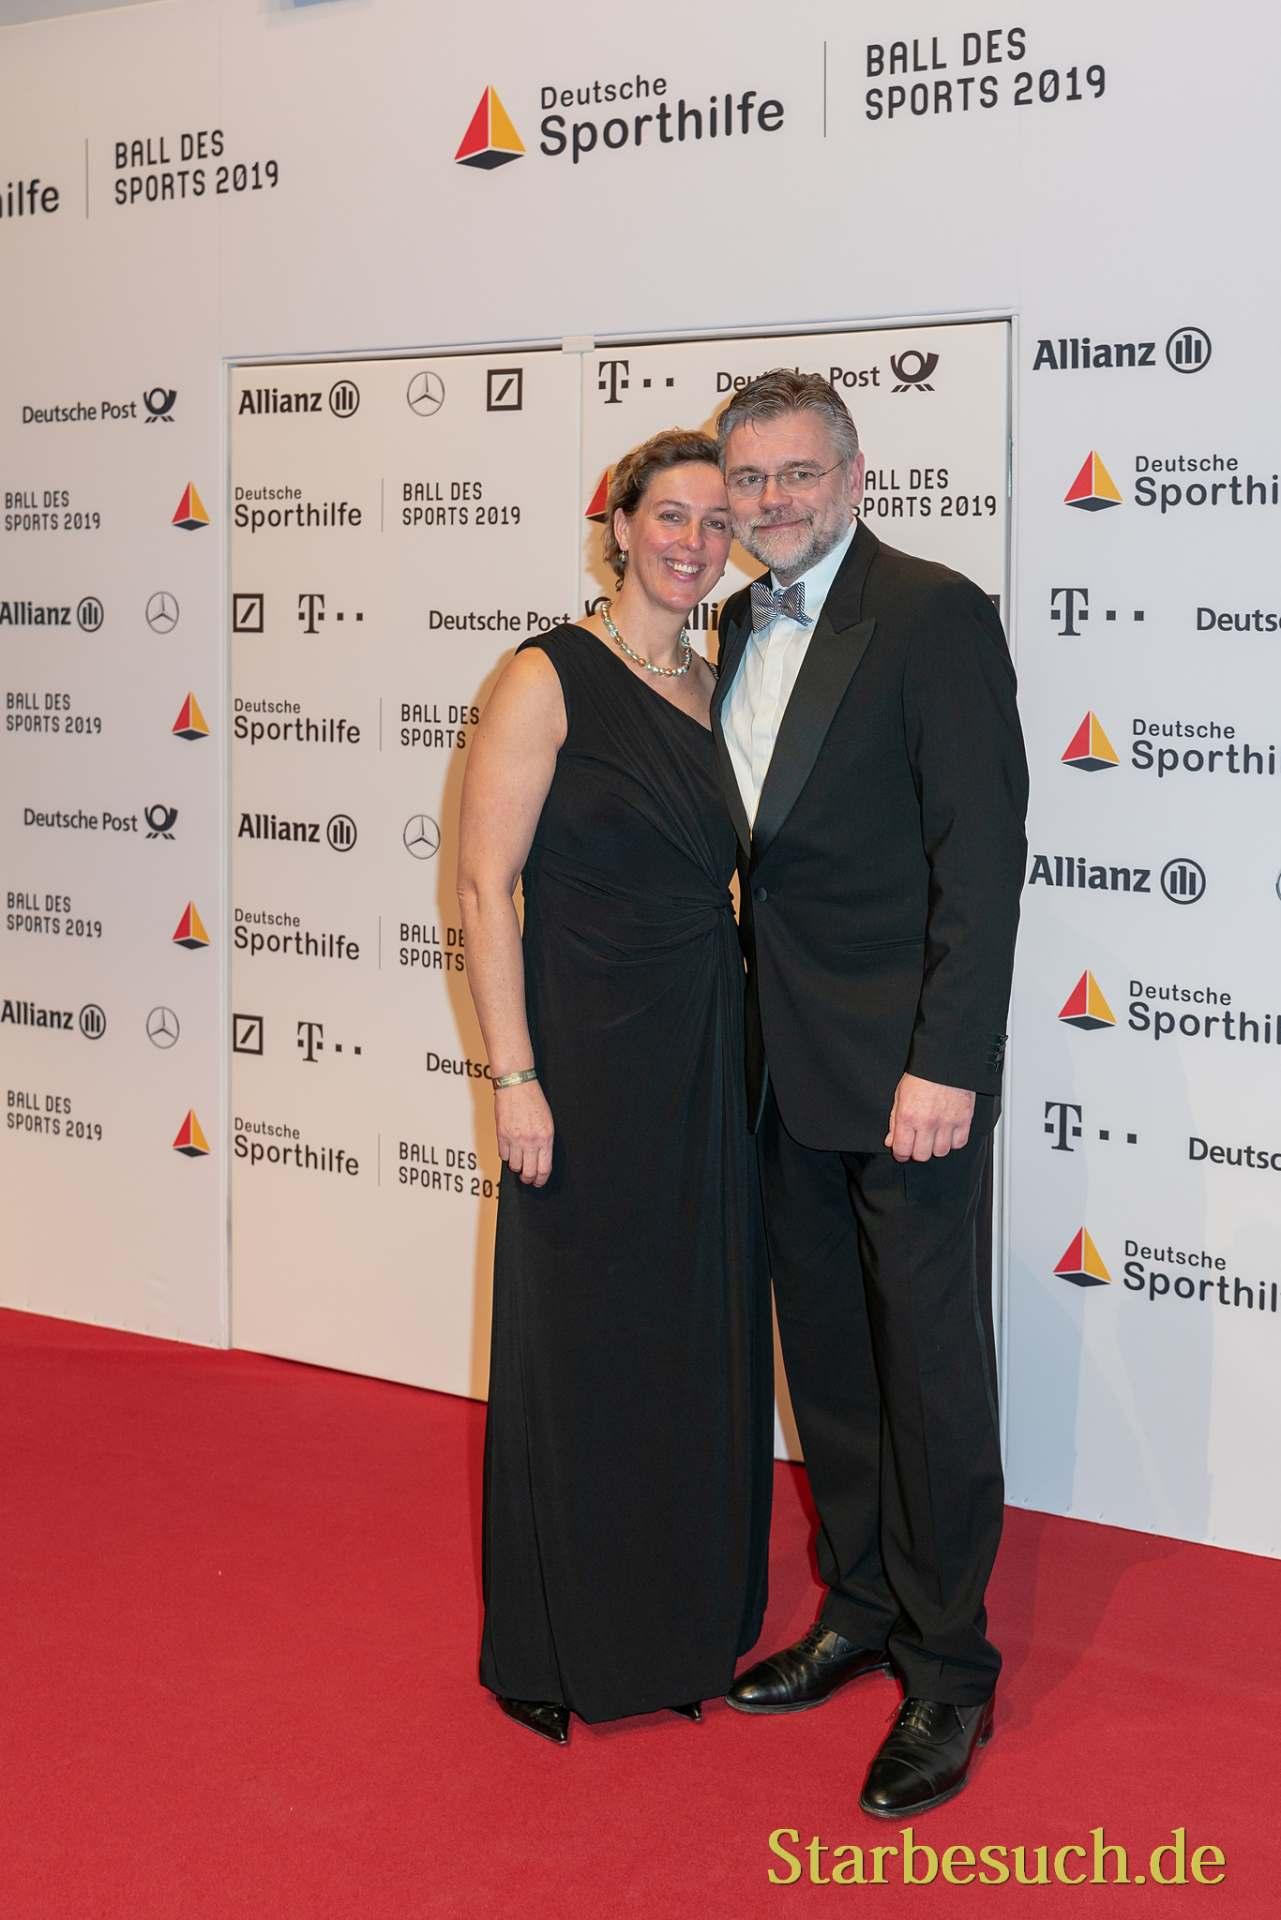 WIESBADEN, Germany - February 2nd, 2019: Steffi Nerius (*1972, German javelin thrower) at Ball des Sports 2019